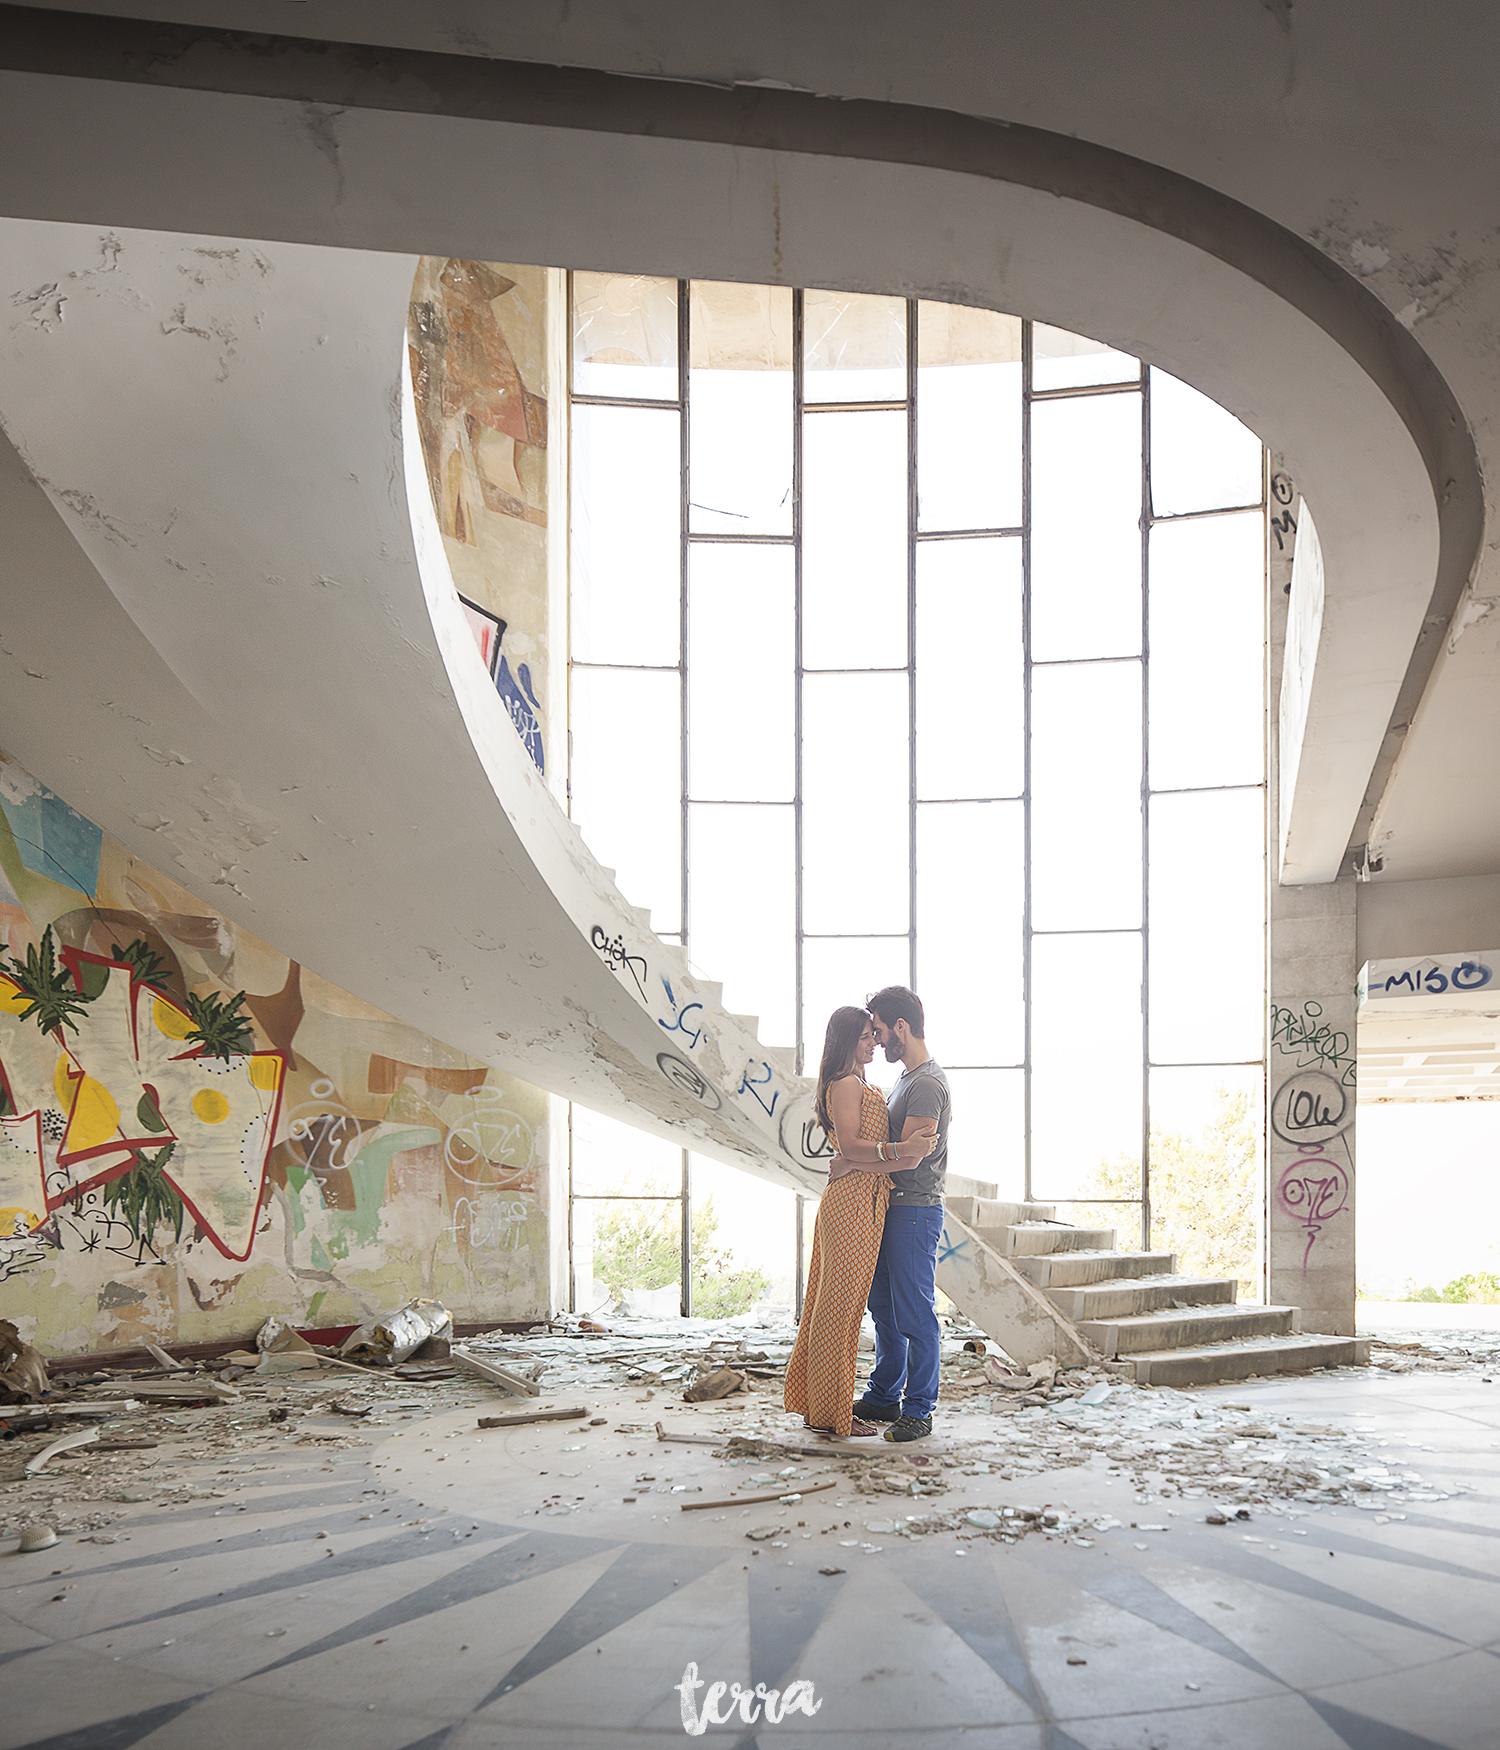 engagement-session-panoramico-monsanto-lisboa-terra-fotografia-21.jpg